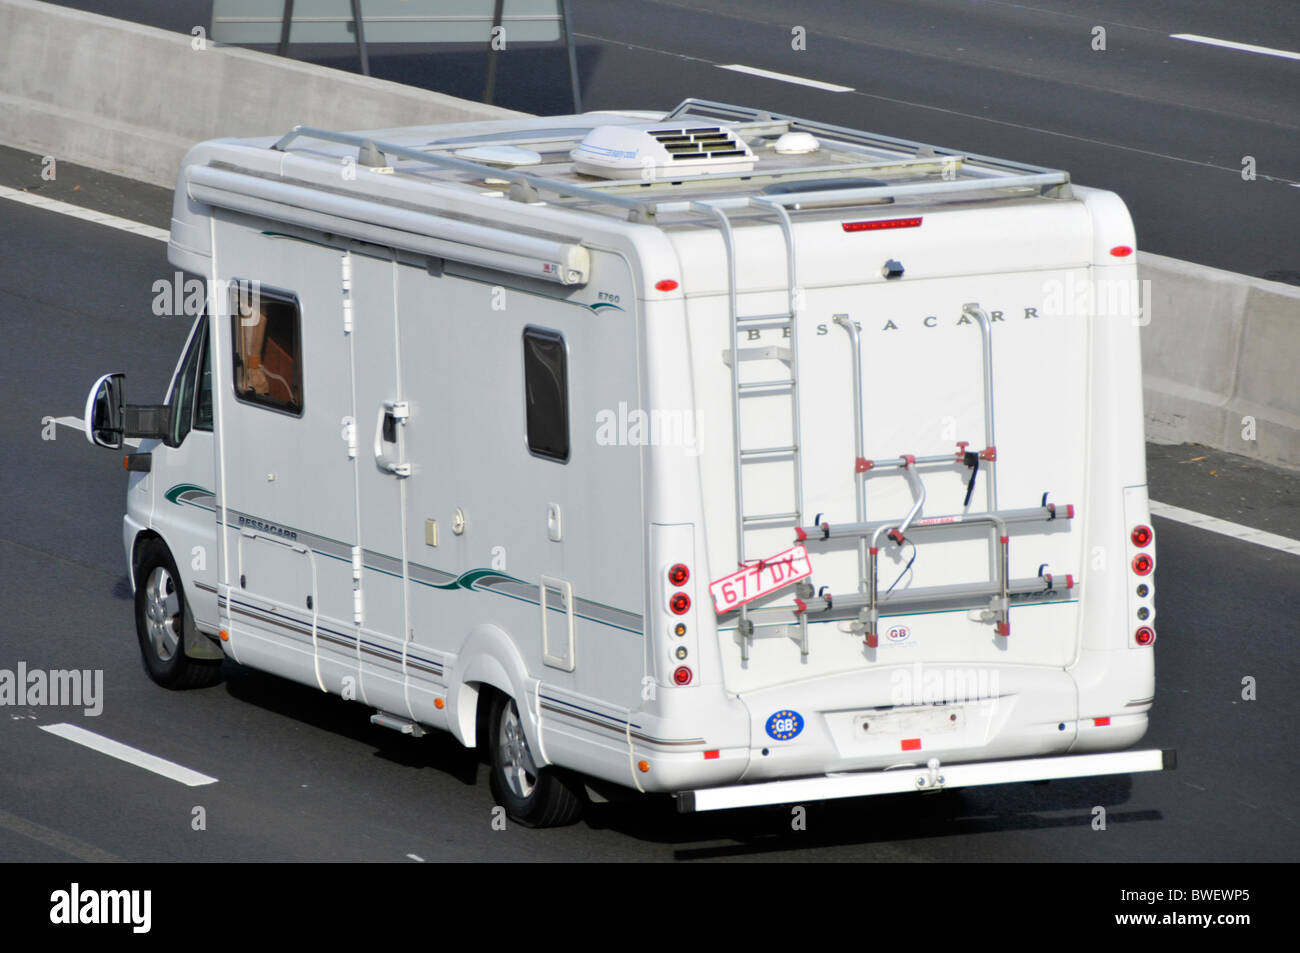 Camper van on M25 motorway driving on trade number plates - Stock Image